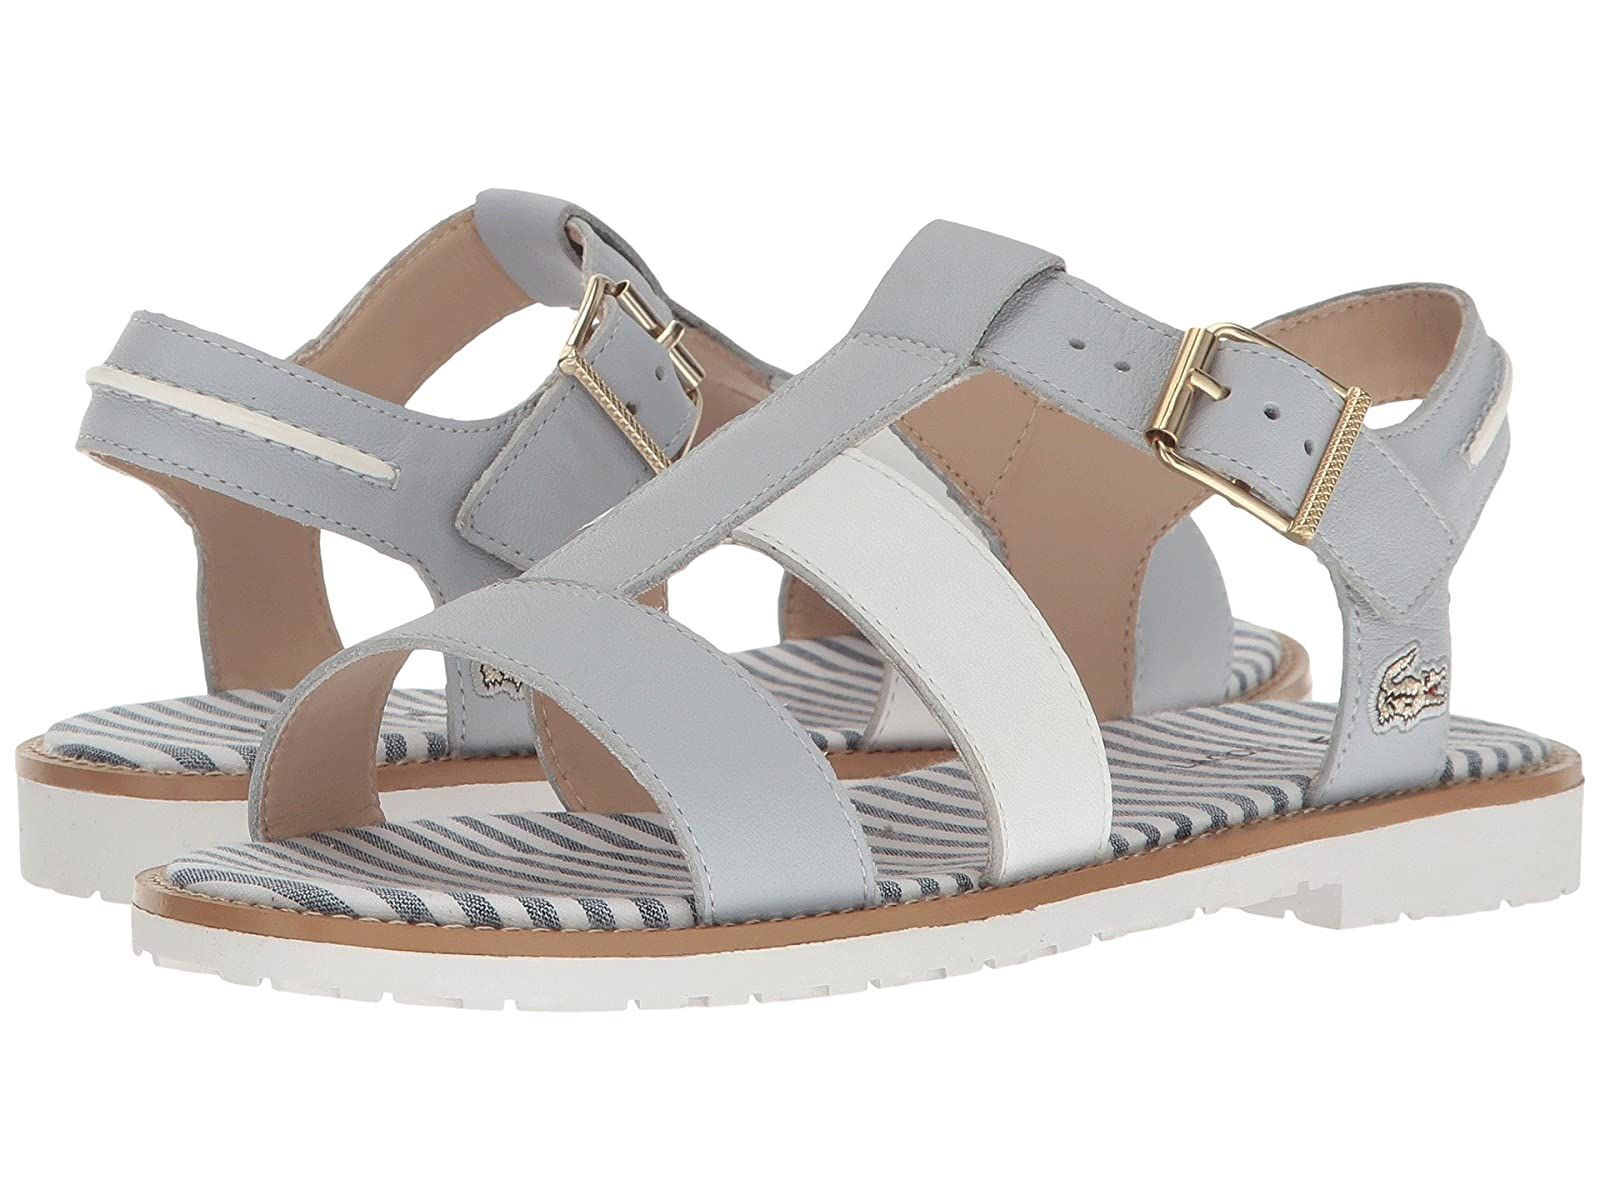 Lacoste Kids Jardena Sandal 217 1 (Little Kid/Big Kid)Cheap and distinctive eye-catching shoes